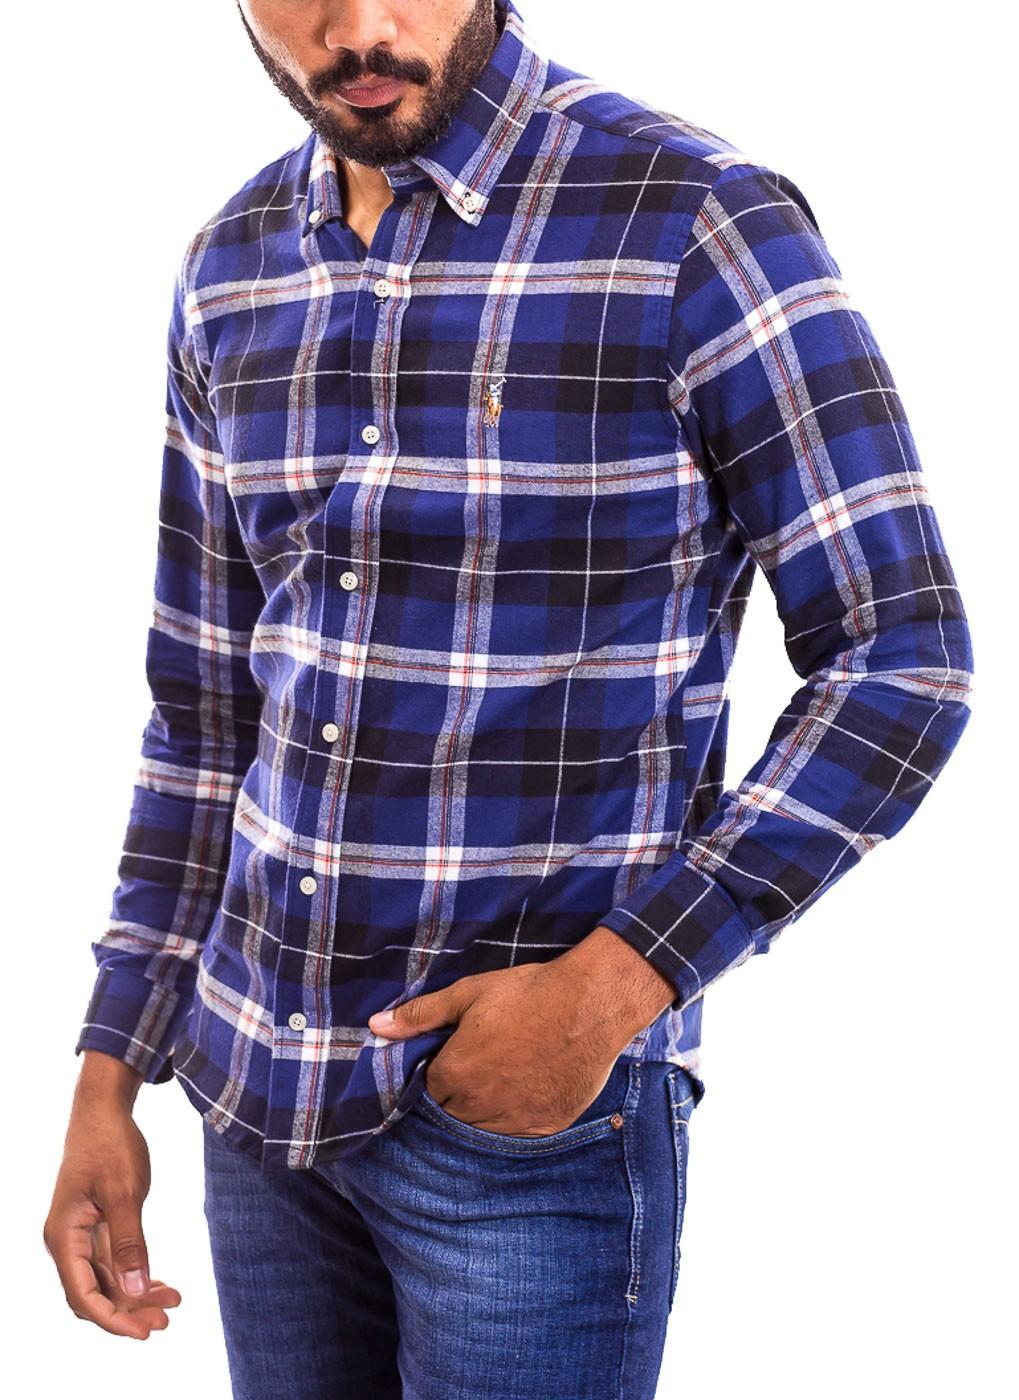 Camisa Ralph Lauren Masculina Custom Fit Checkered Pony Colors Xadrez Flanelada Azul Marinho